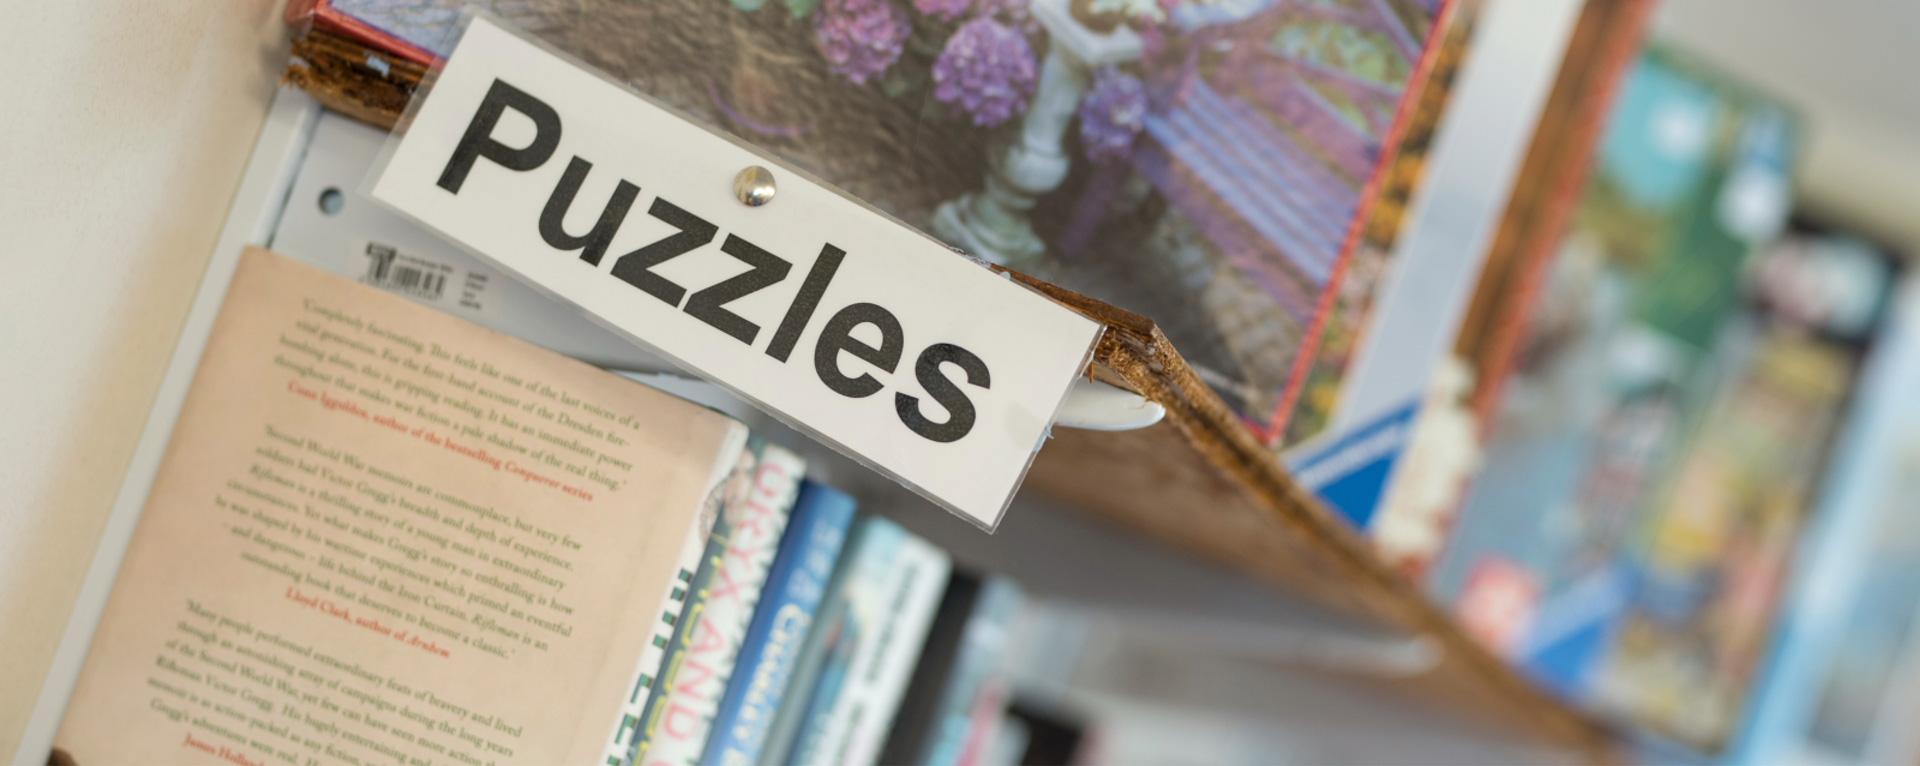 sliders_puzzles